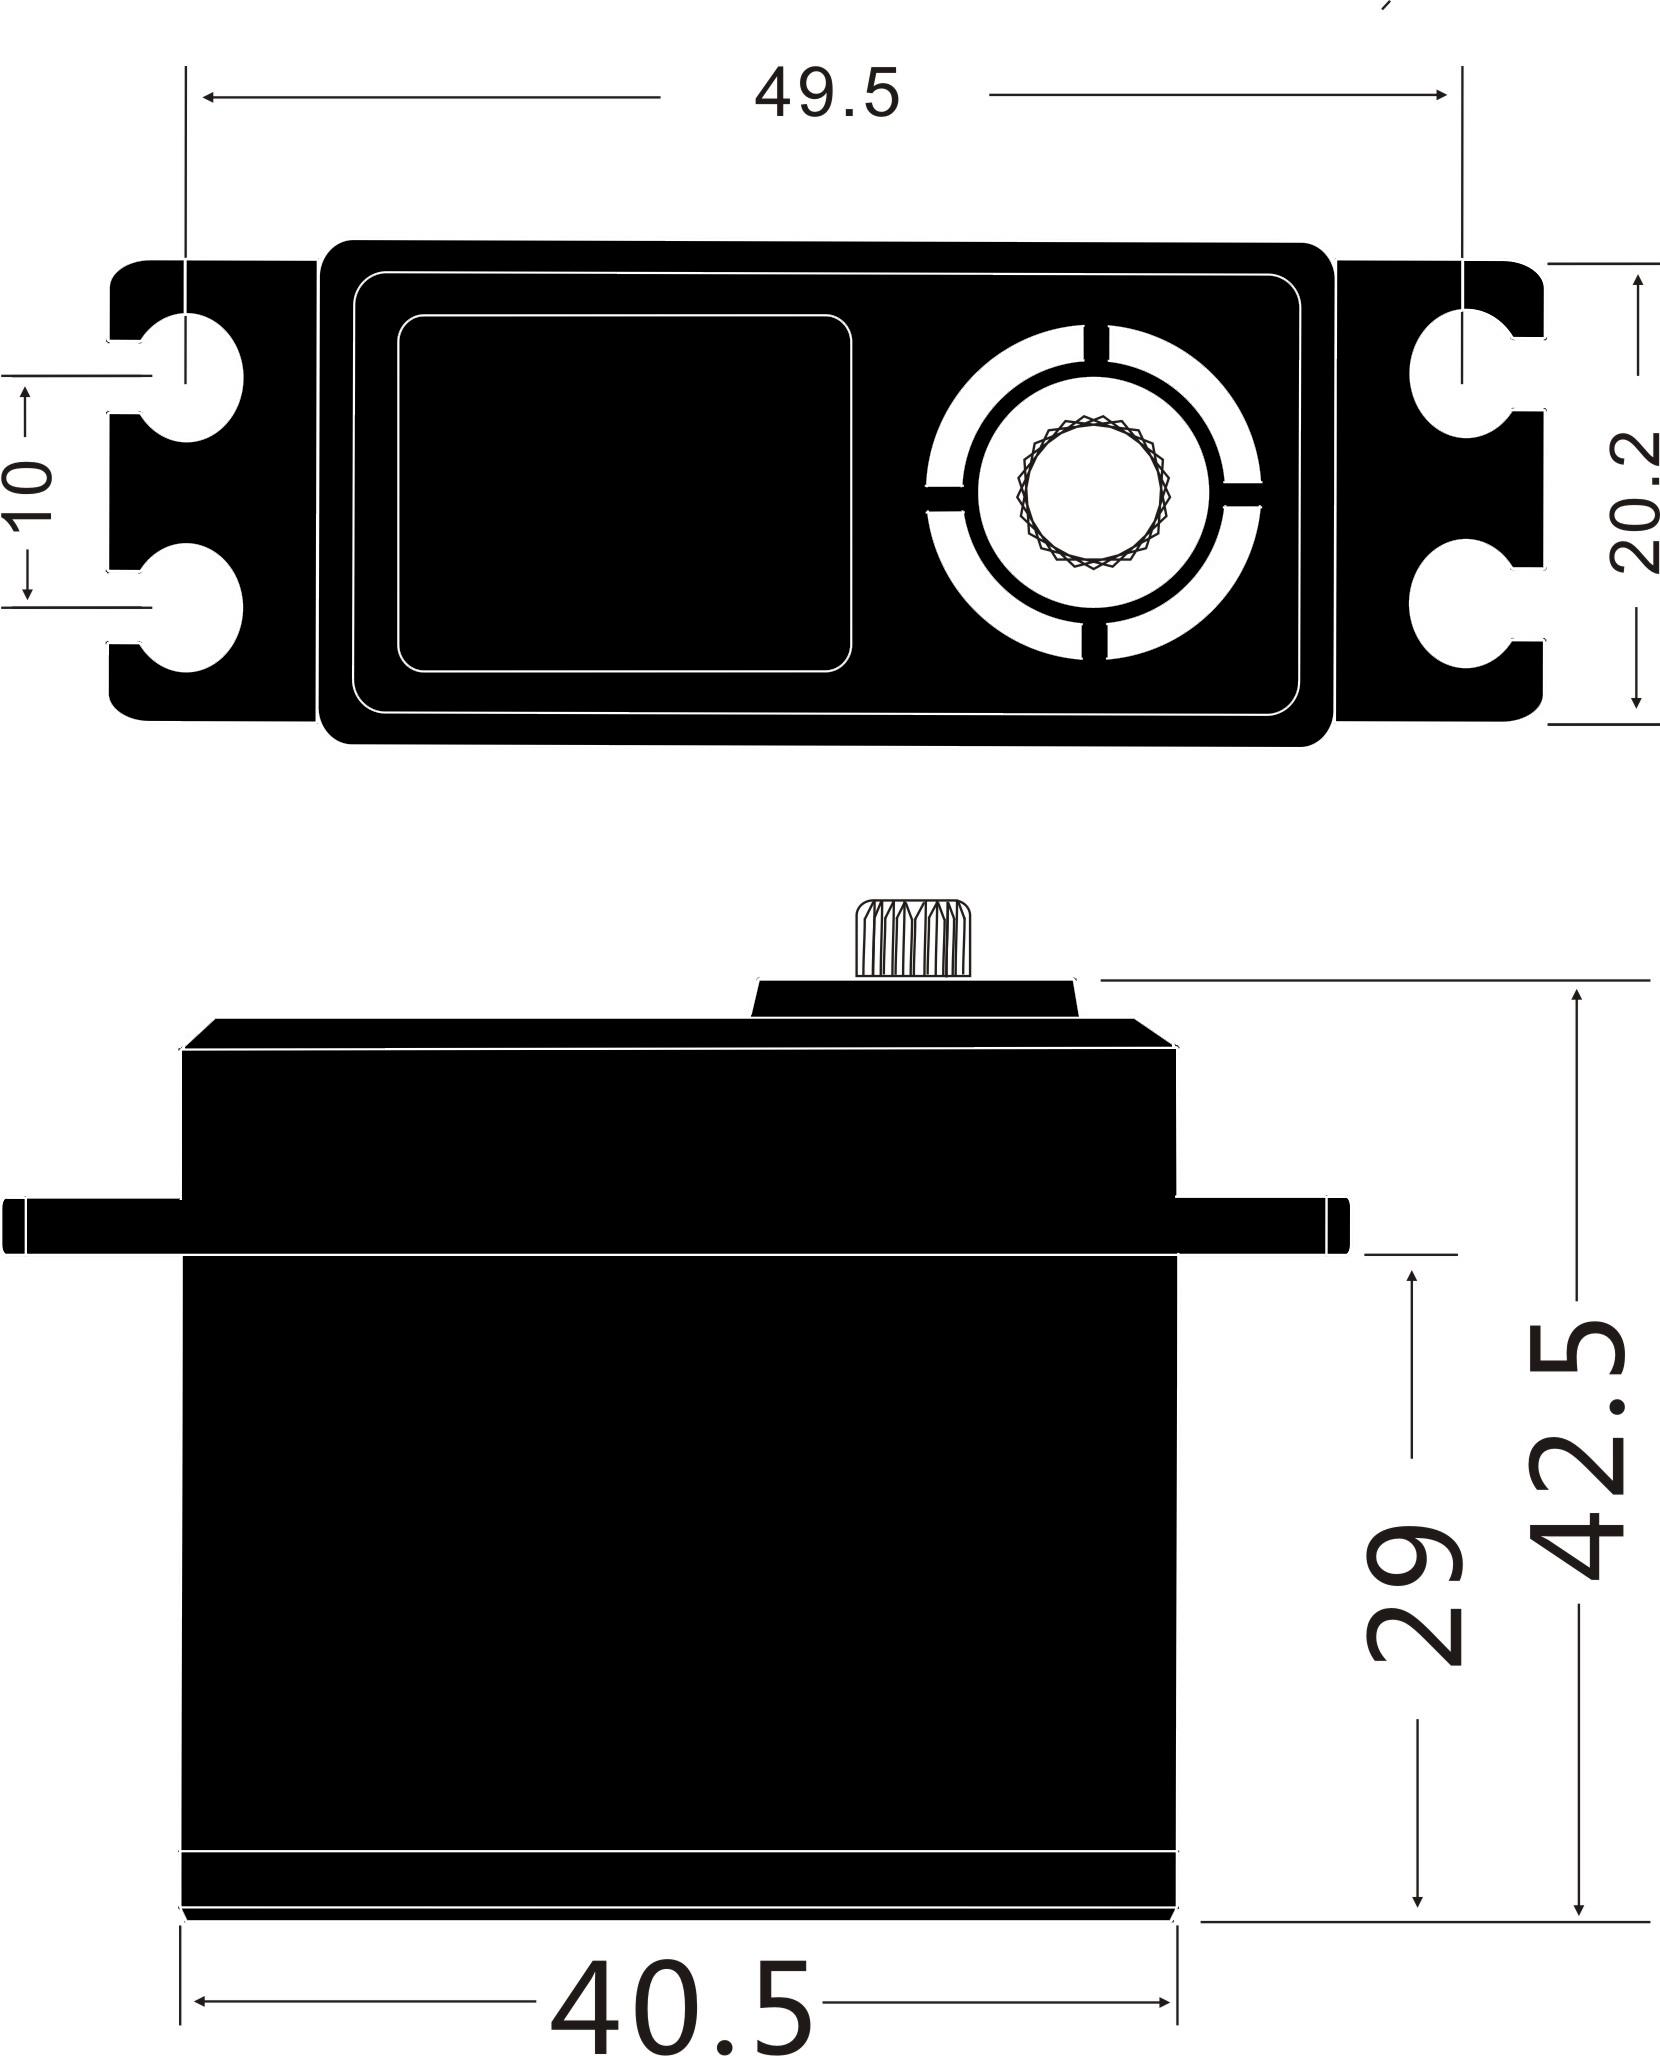 Click image for larger version  Name:HV-1963=STD-2563MG.jpg Views:134 Size:240.0 KB ID:2154907